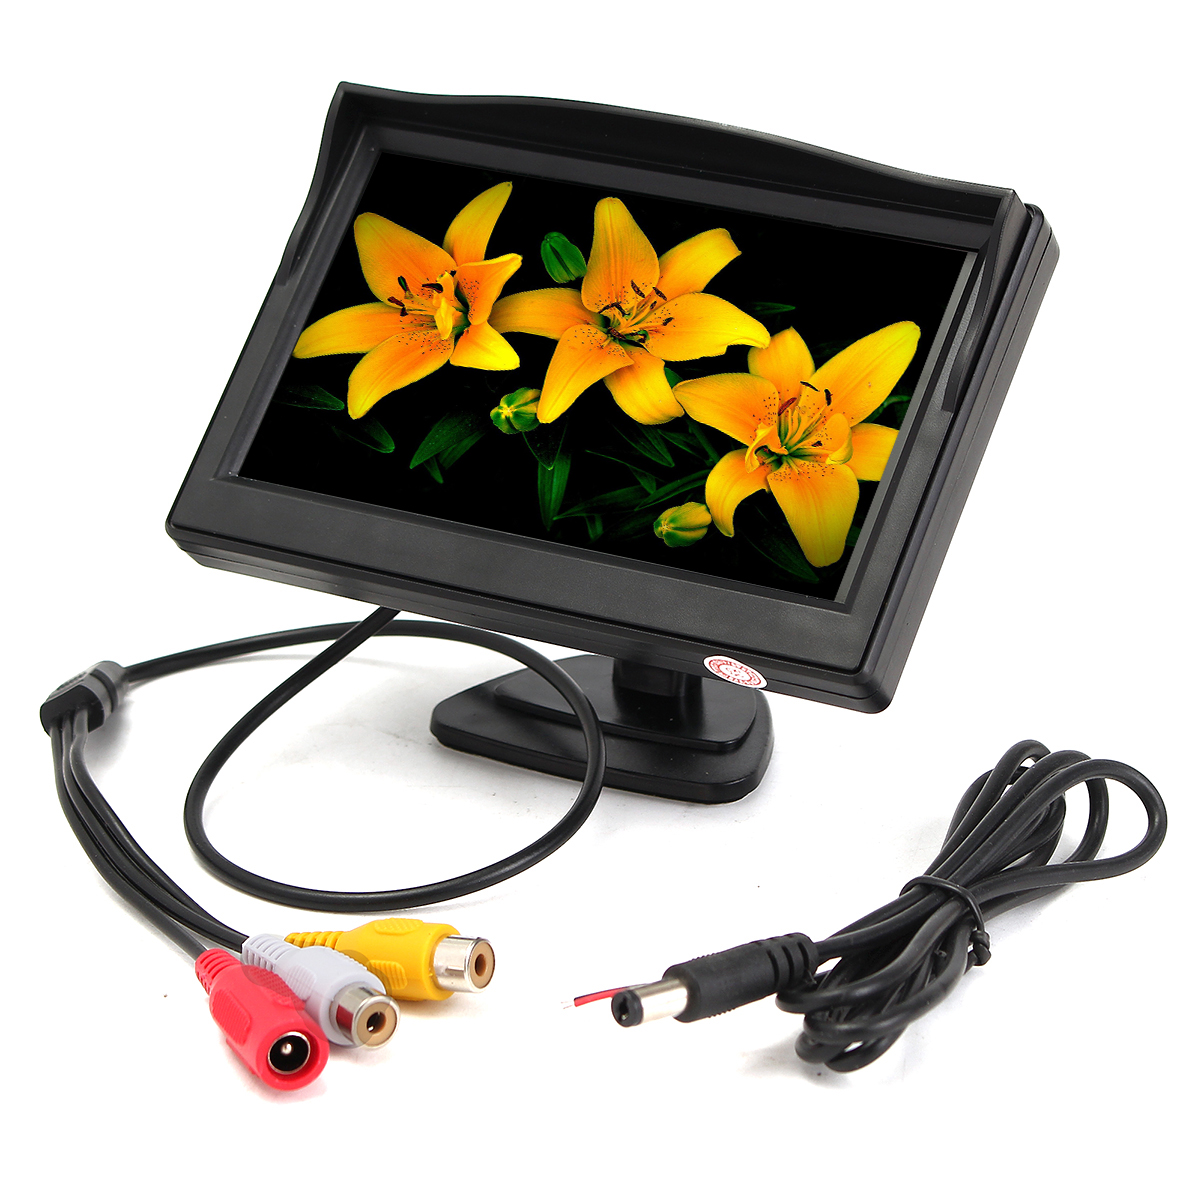 "5"" TFT LCD Car Monitor Screen Display for DVD Rearview Reverse Backup Camera Kit"